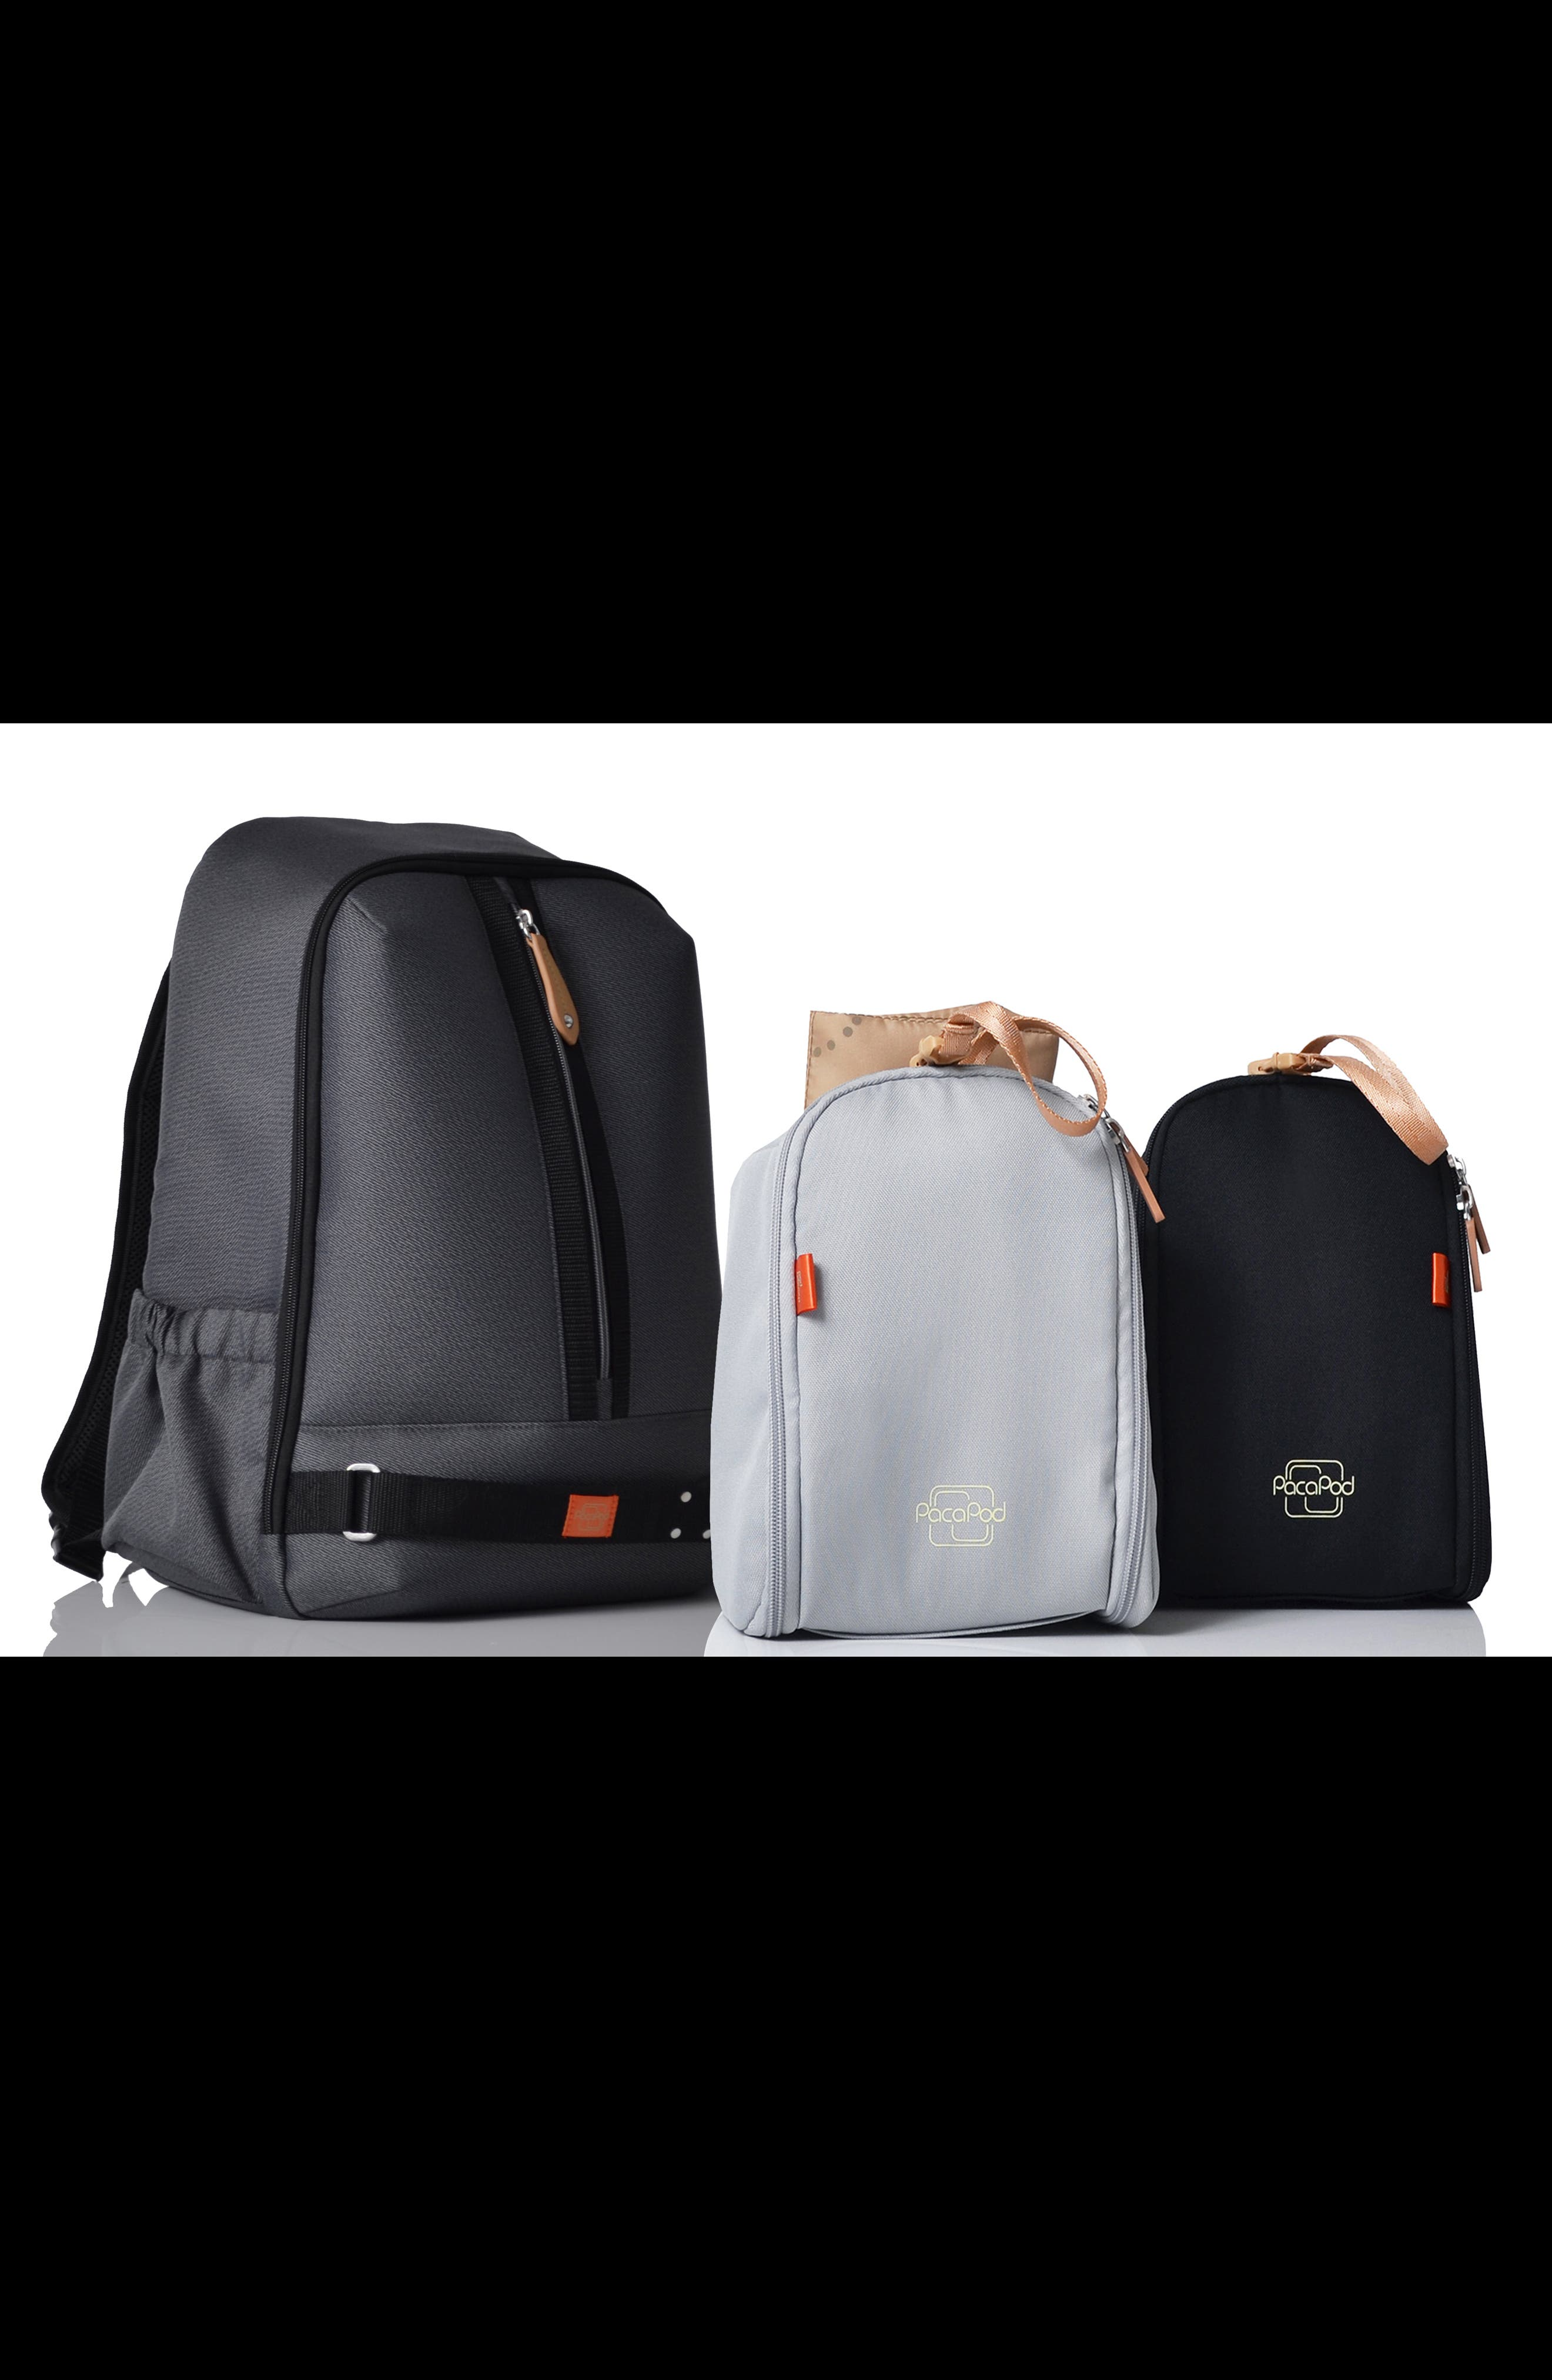 Picos Pack Diaper Backpack,                             Alternate thumbnail 4, color,                             BLACK CHARCOAL